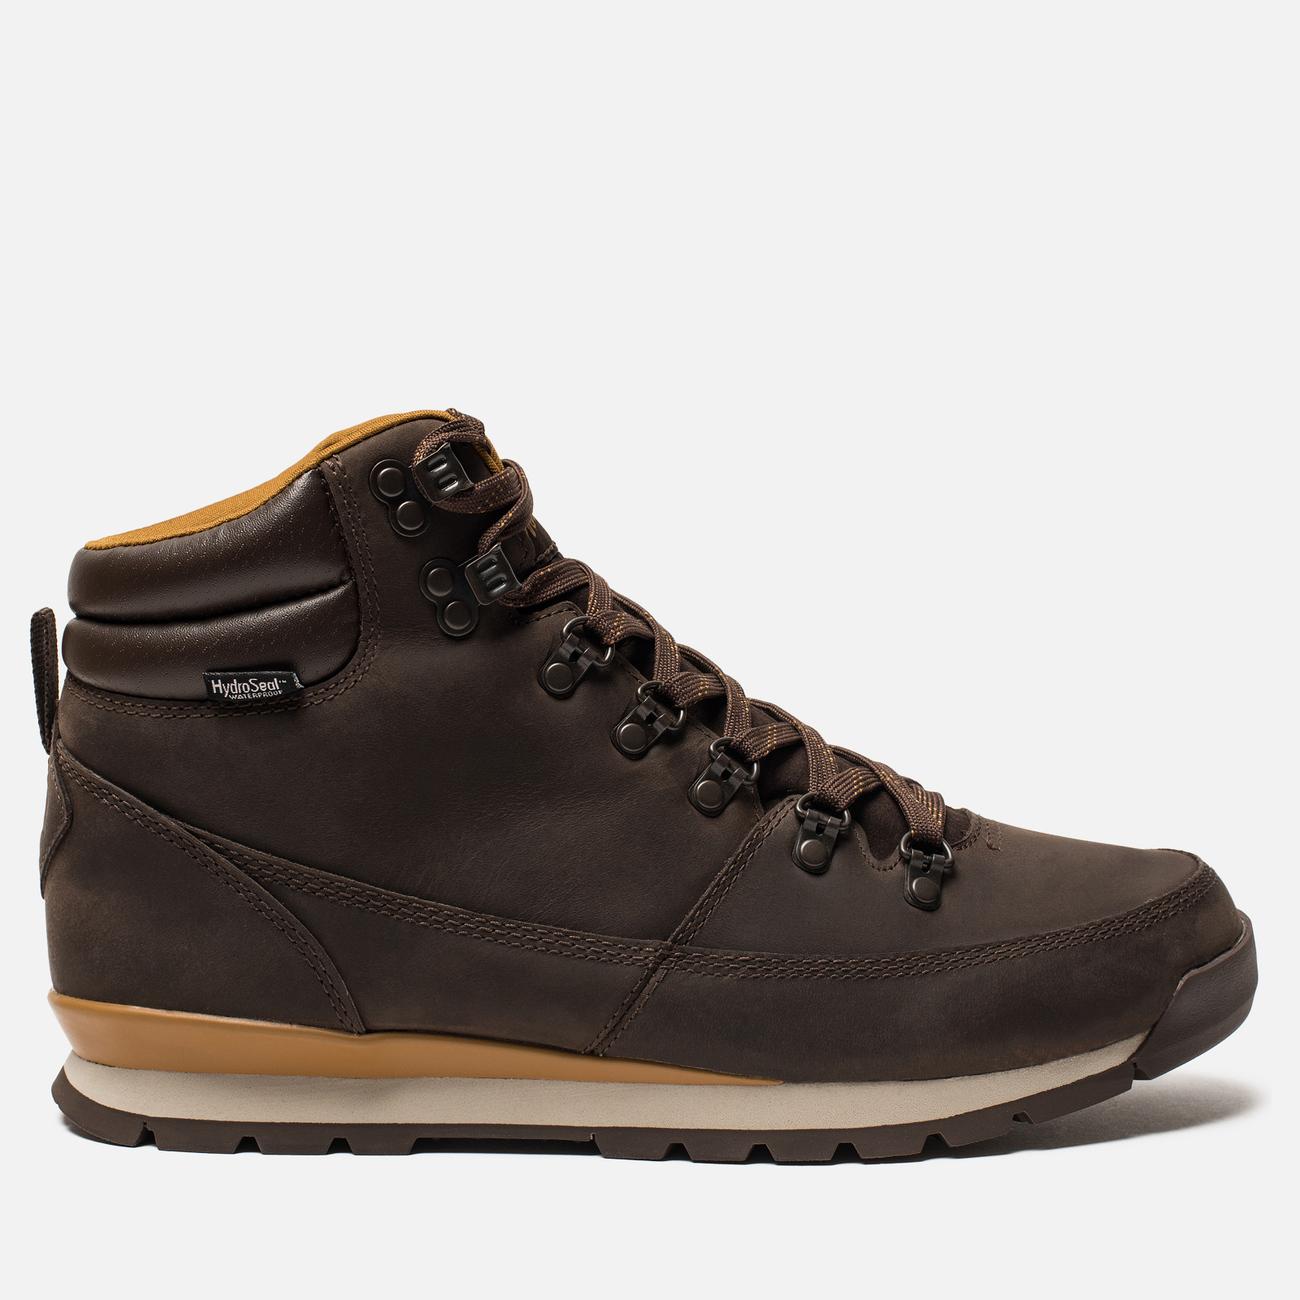 Мужские зимние ботинки The North Face Back To Berkeley Redux Leather Chocolate Brown/Golden Brown